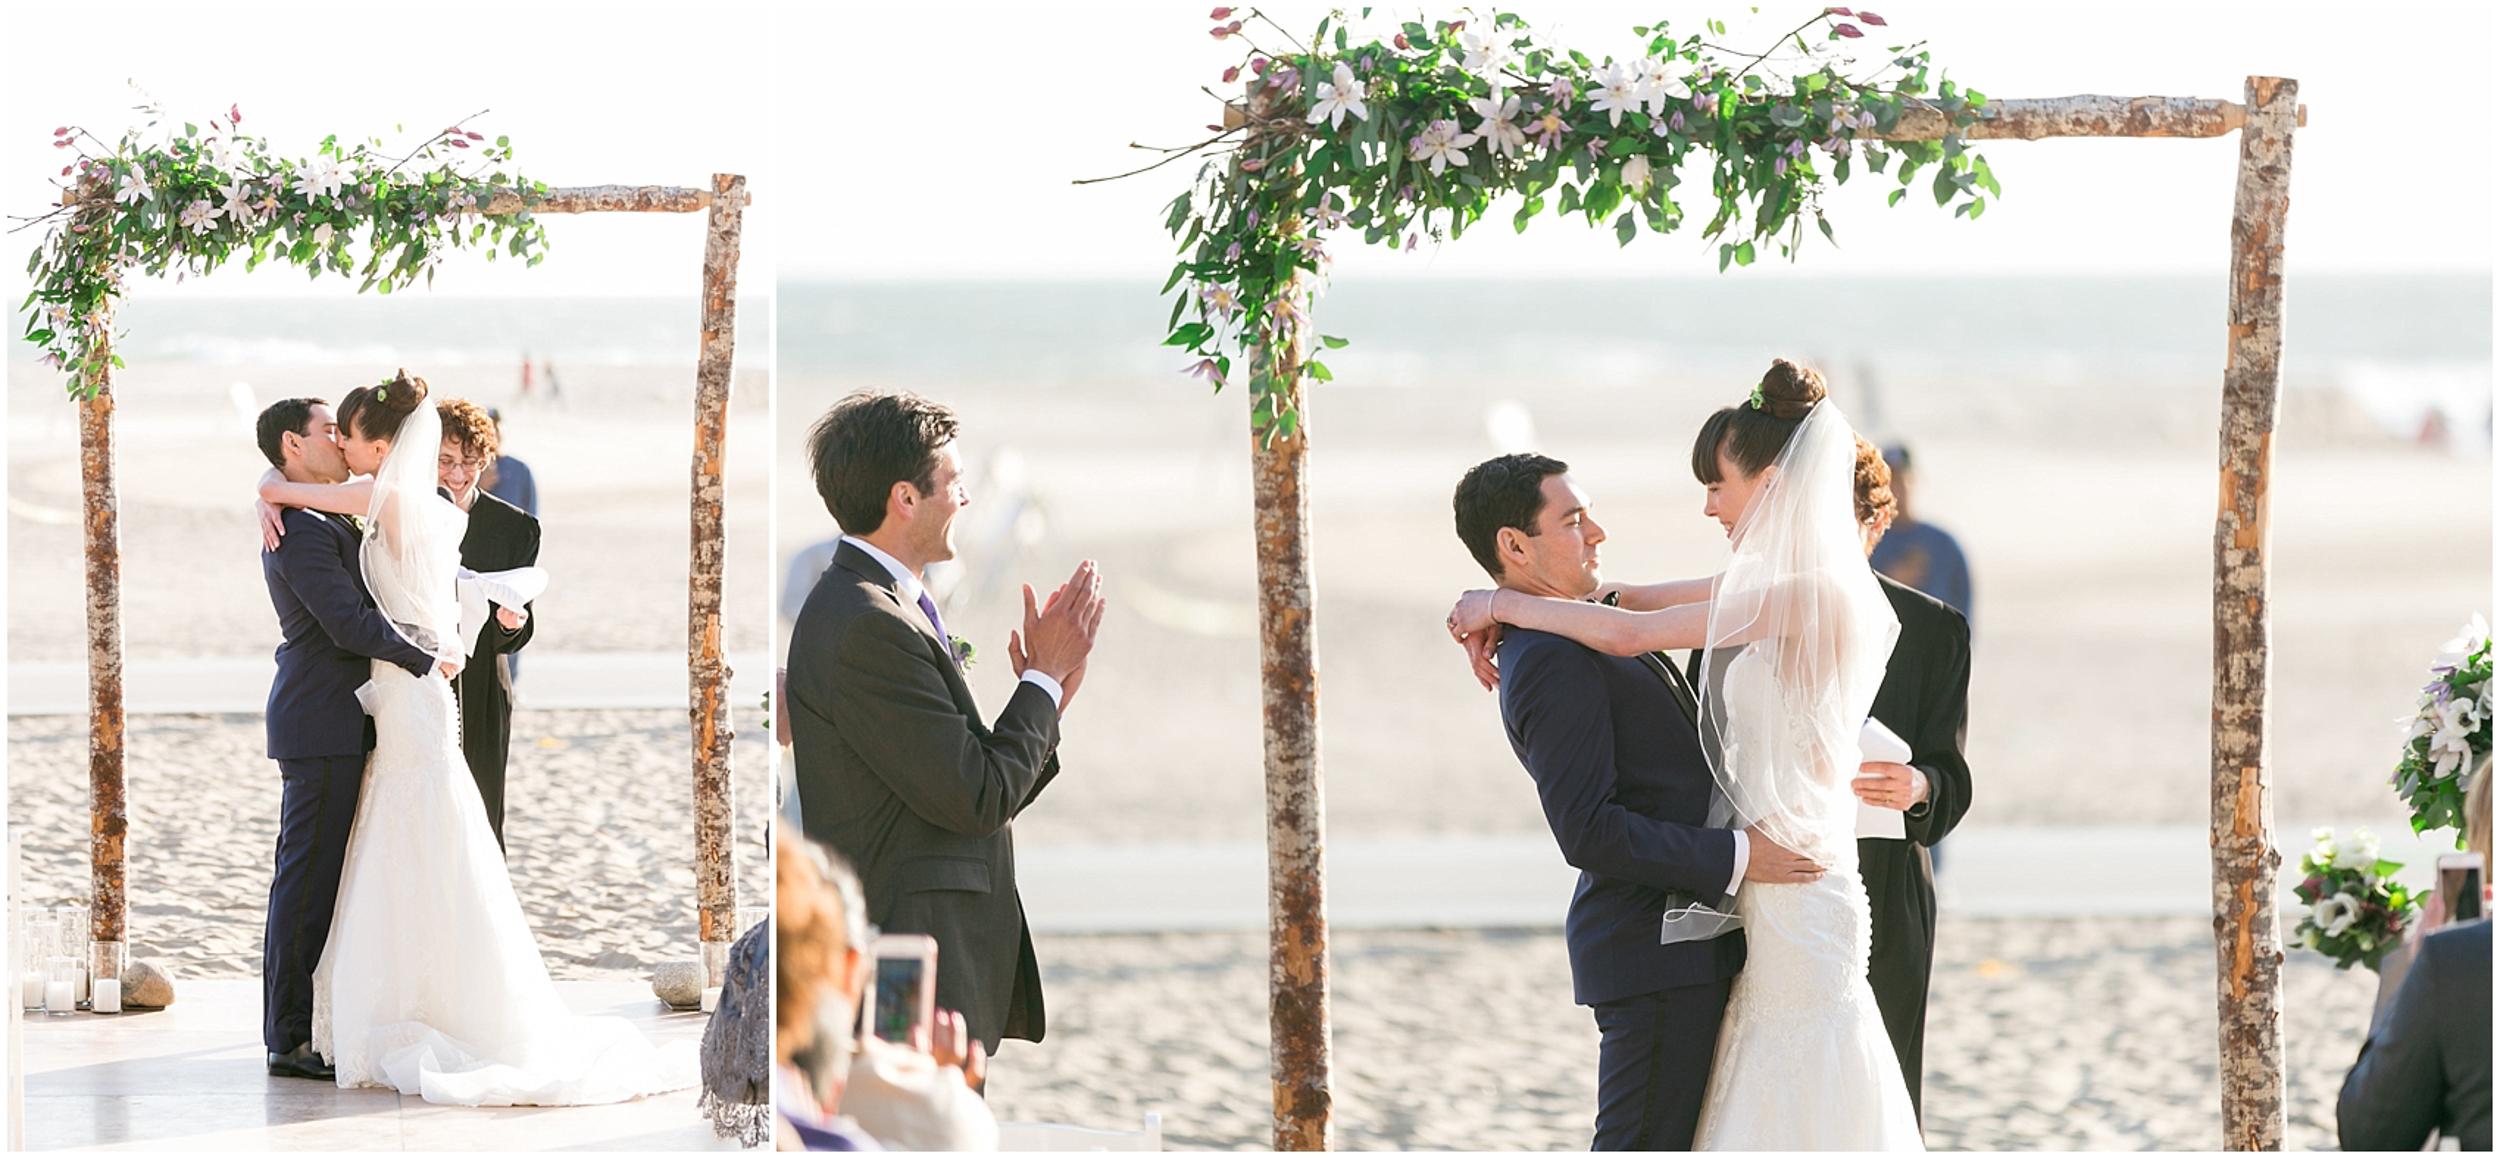 Casa Del Mar Wedding Photography Smetona Photo-0044.jpg